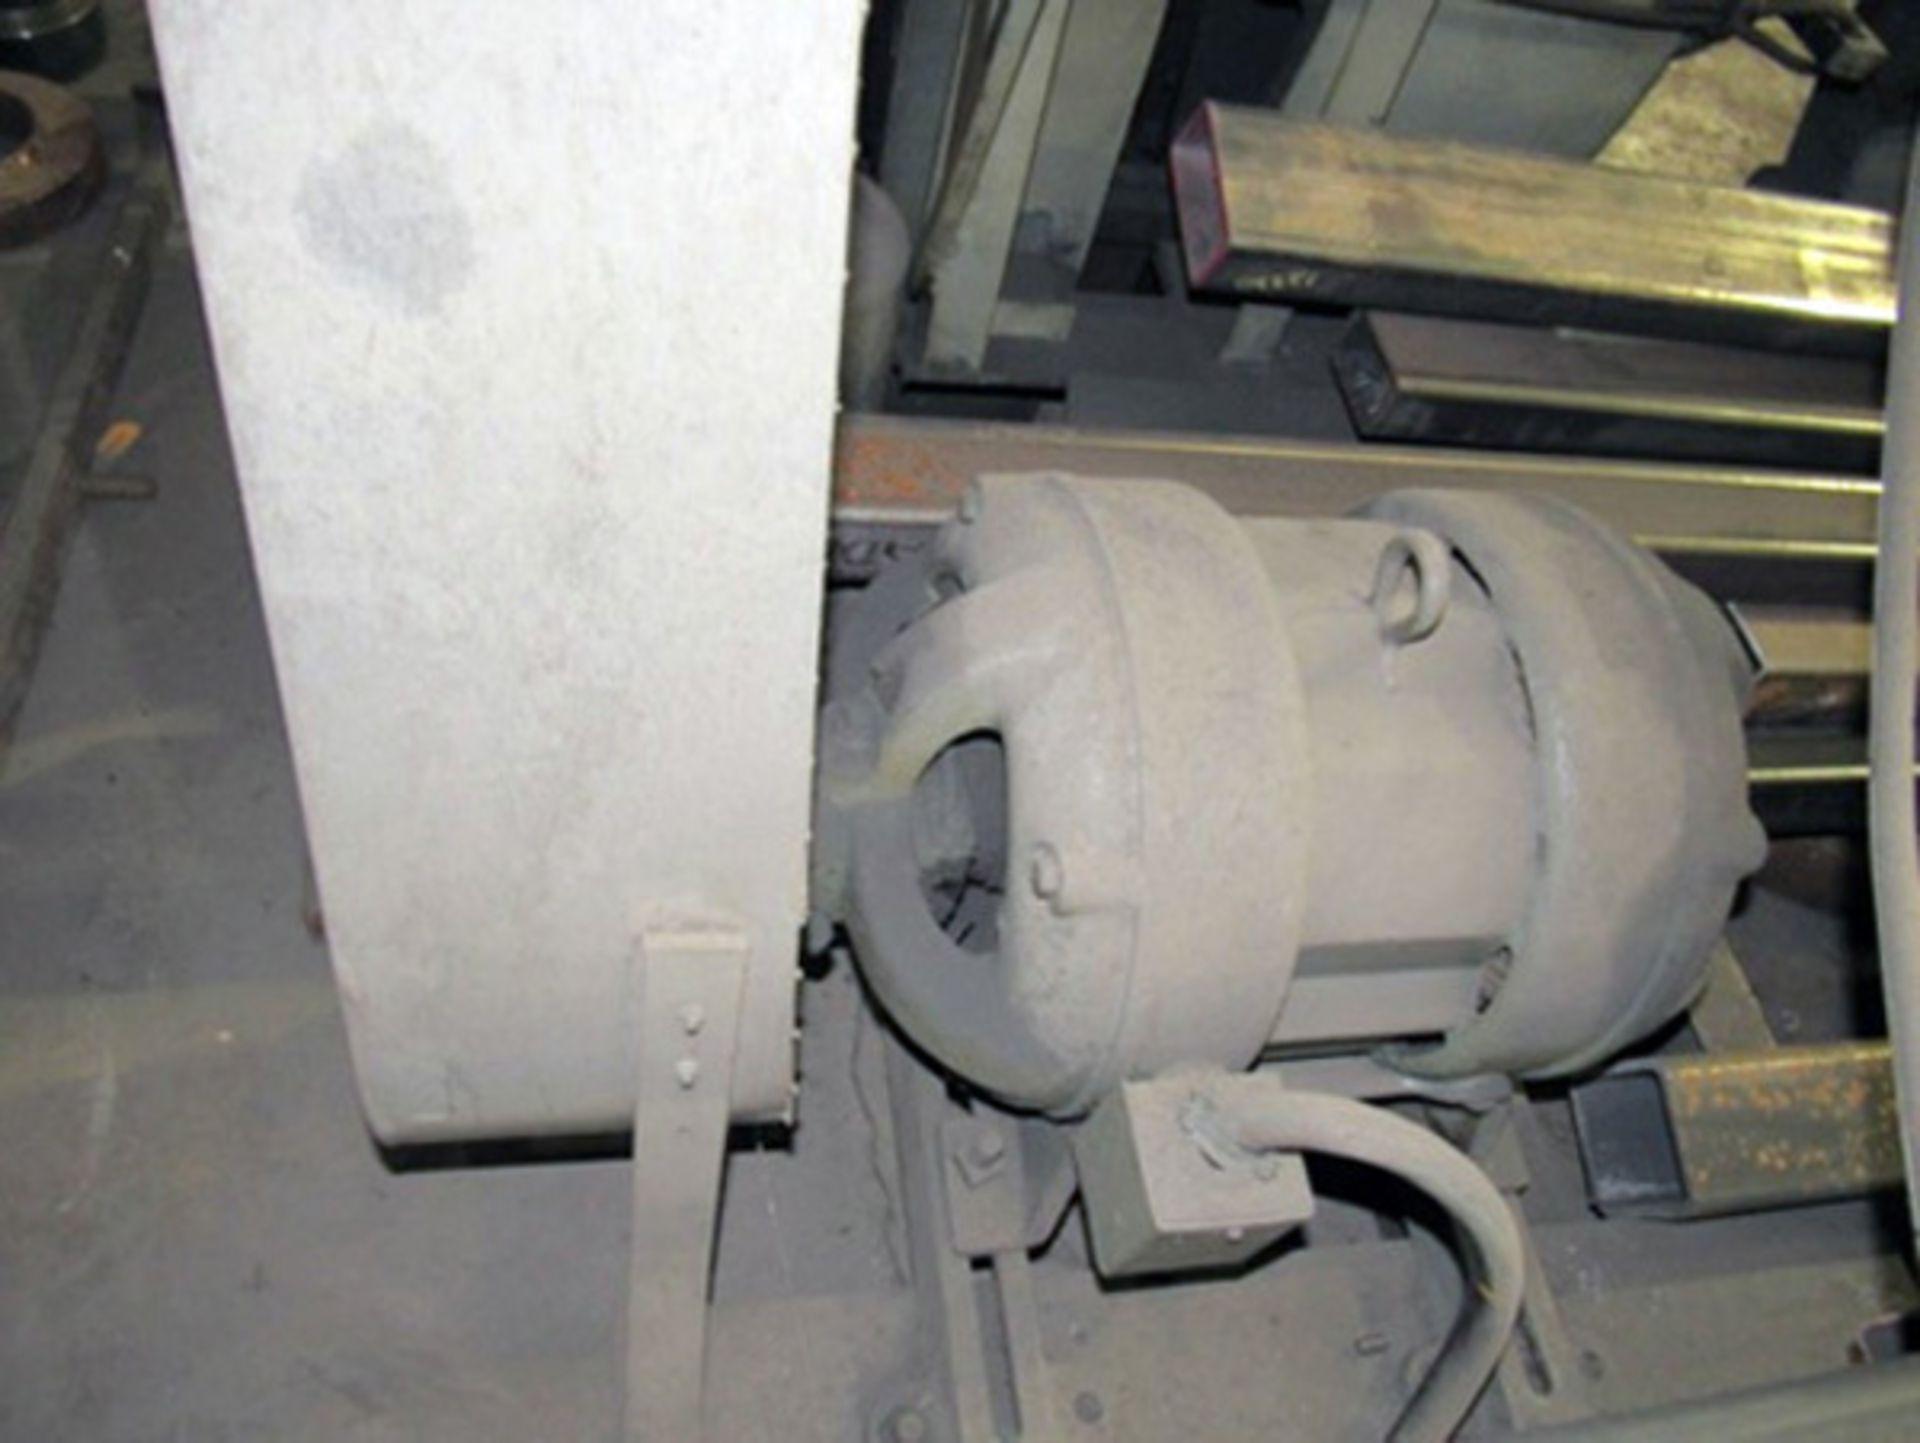 "Rogers Hydraulic Wheel Press | 100-Ton x 120"", Mdl: 2877, S/N: N/A - 8097P - Image 7 of 7"